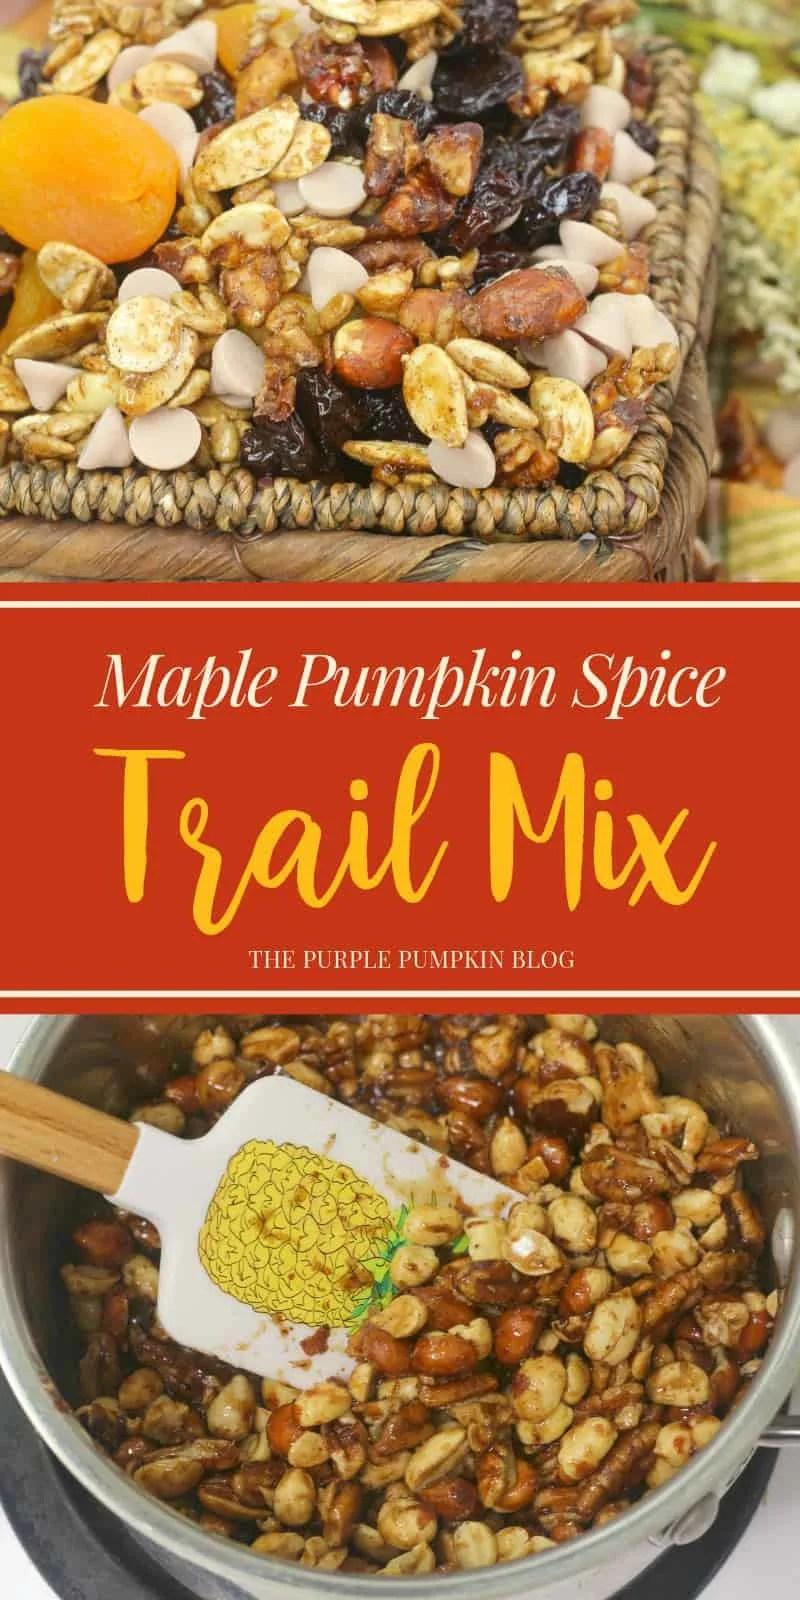 Maple pumpkin spice trail mix